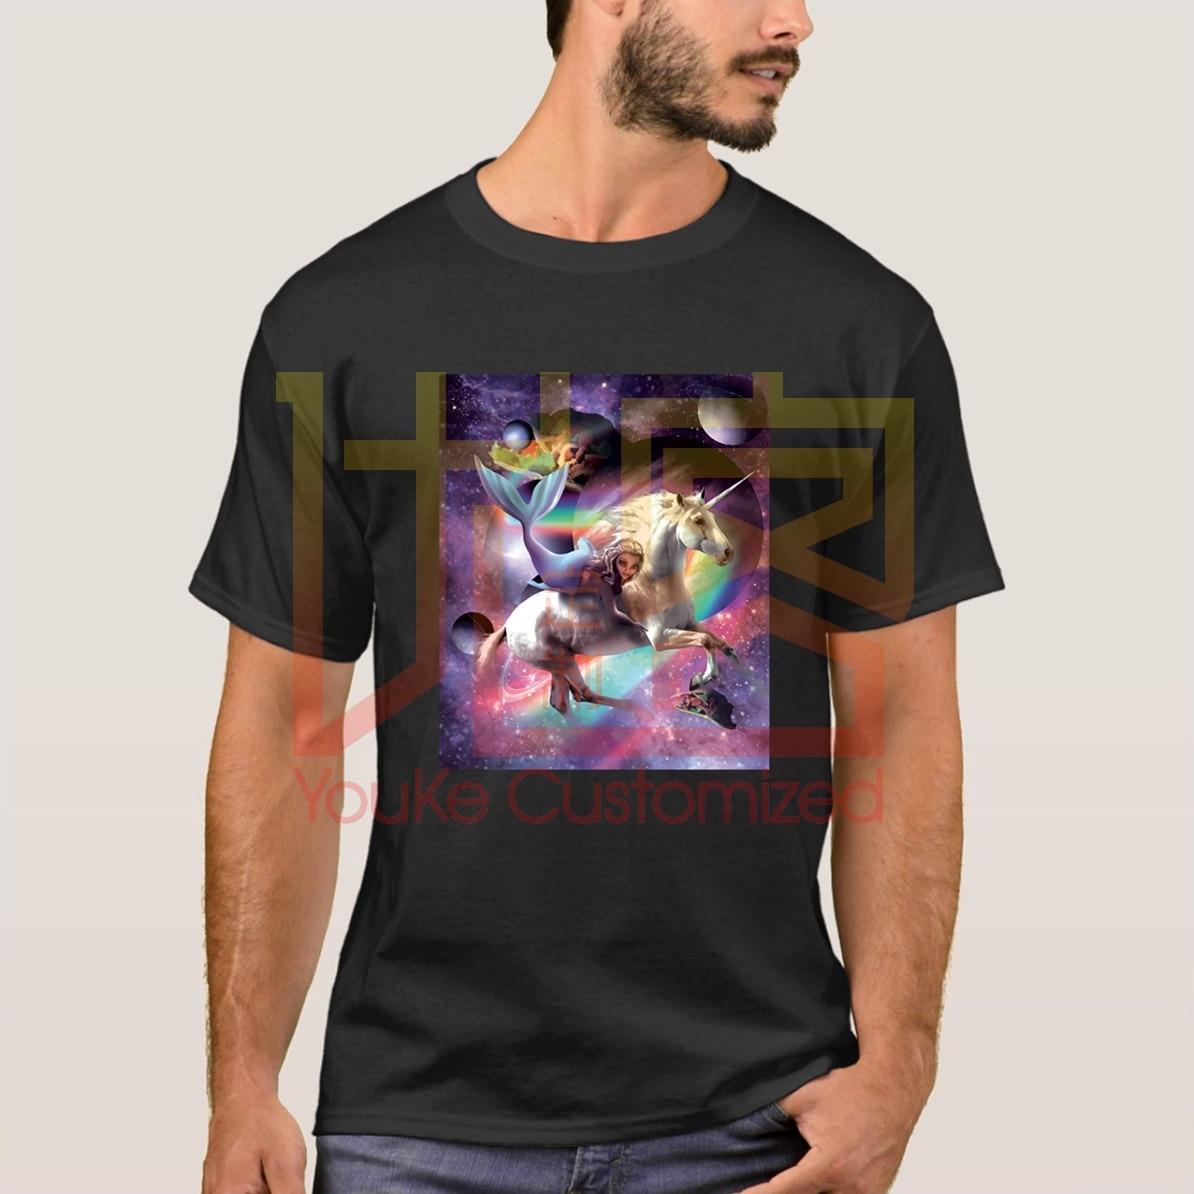 Camiseta Space Mermaid Riding unicornios-Tacos y arcoíris, regalo divertido, 100%, camiseta de manga corta de algodón